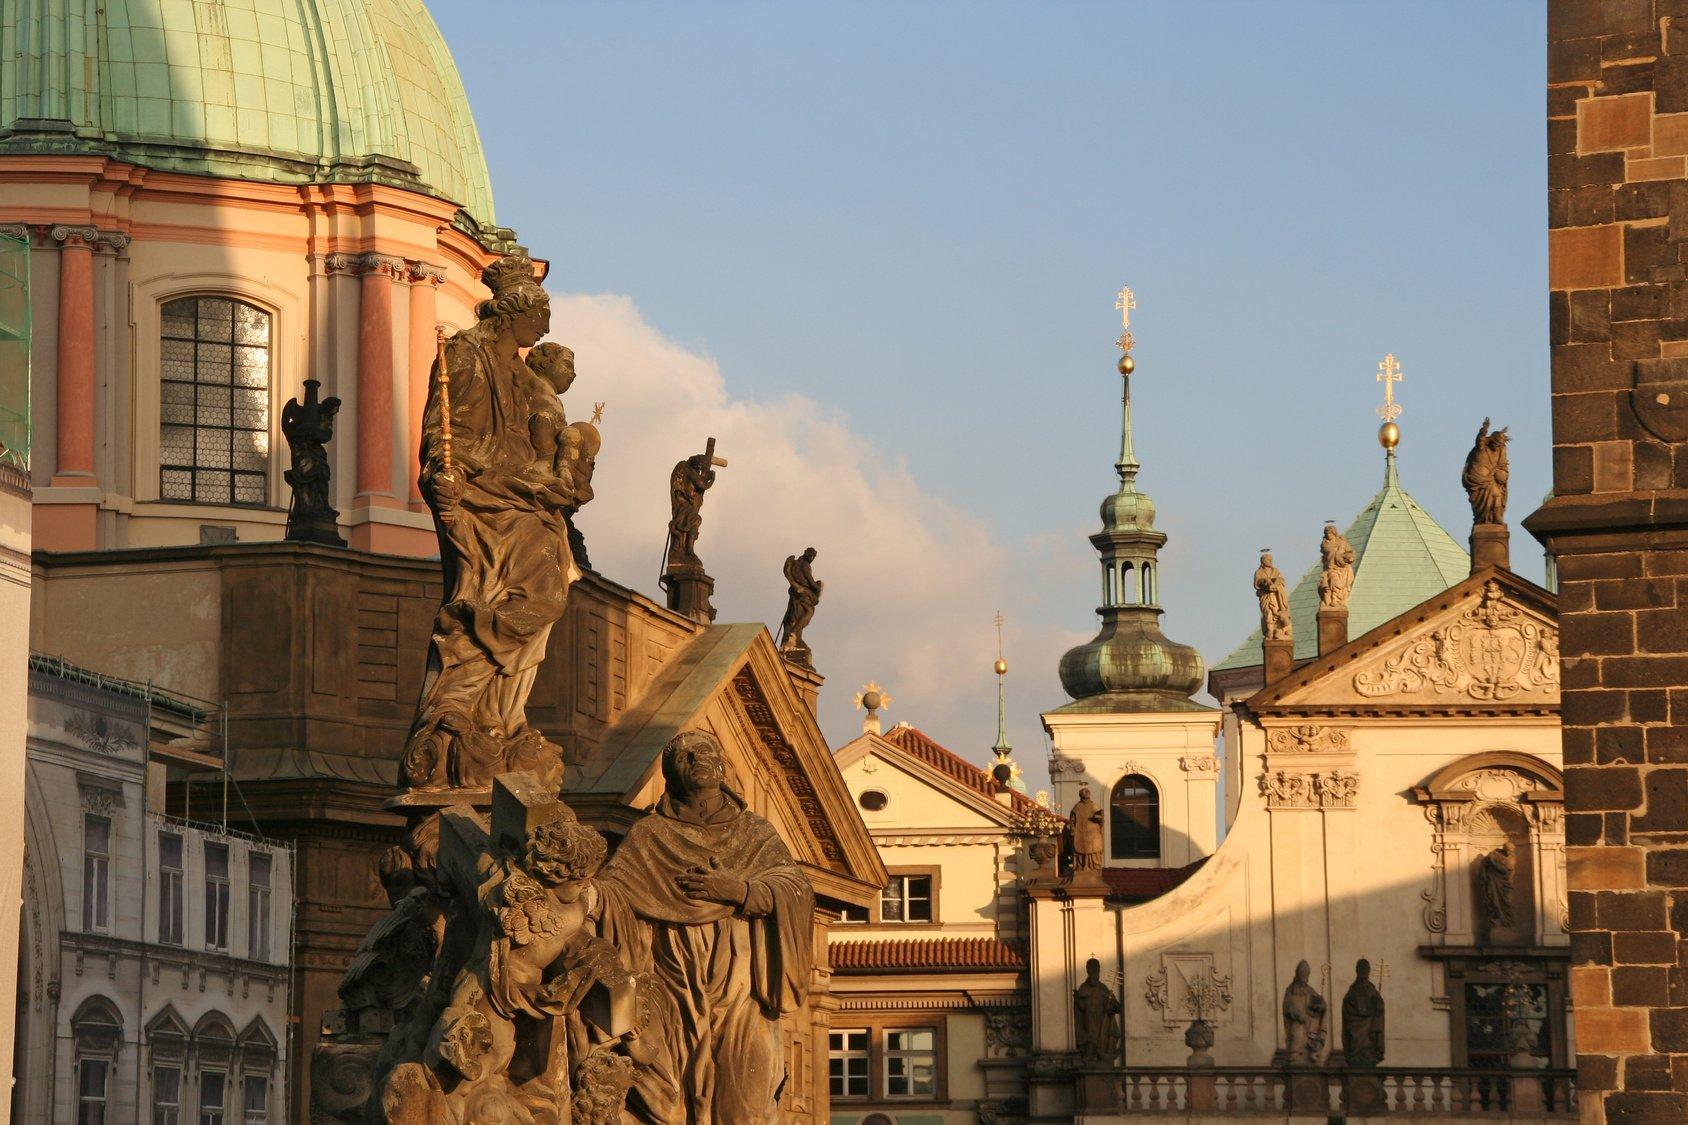 Want Better Fertility Care, Go Czech it Out